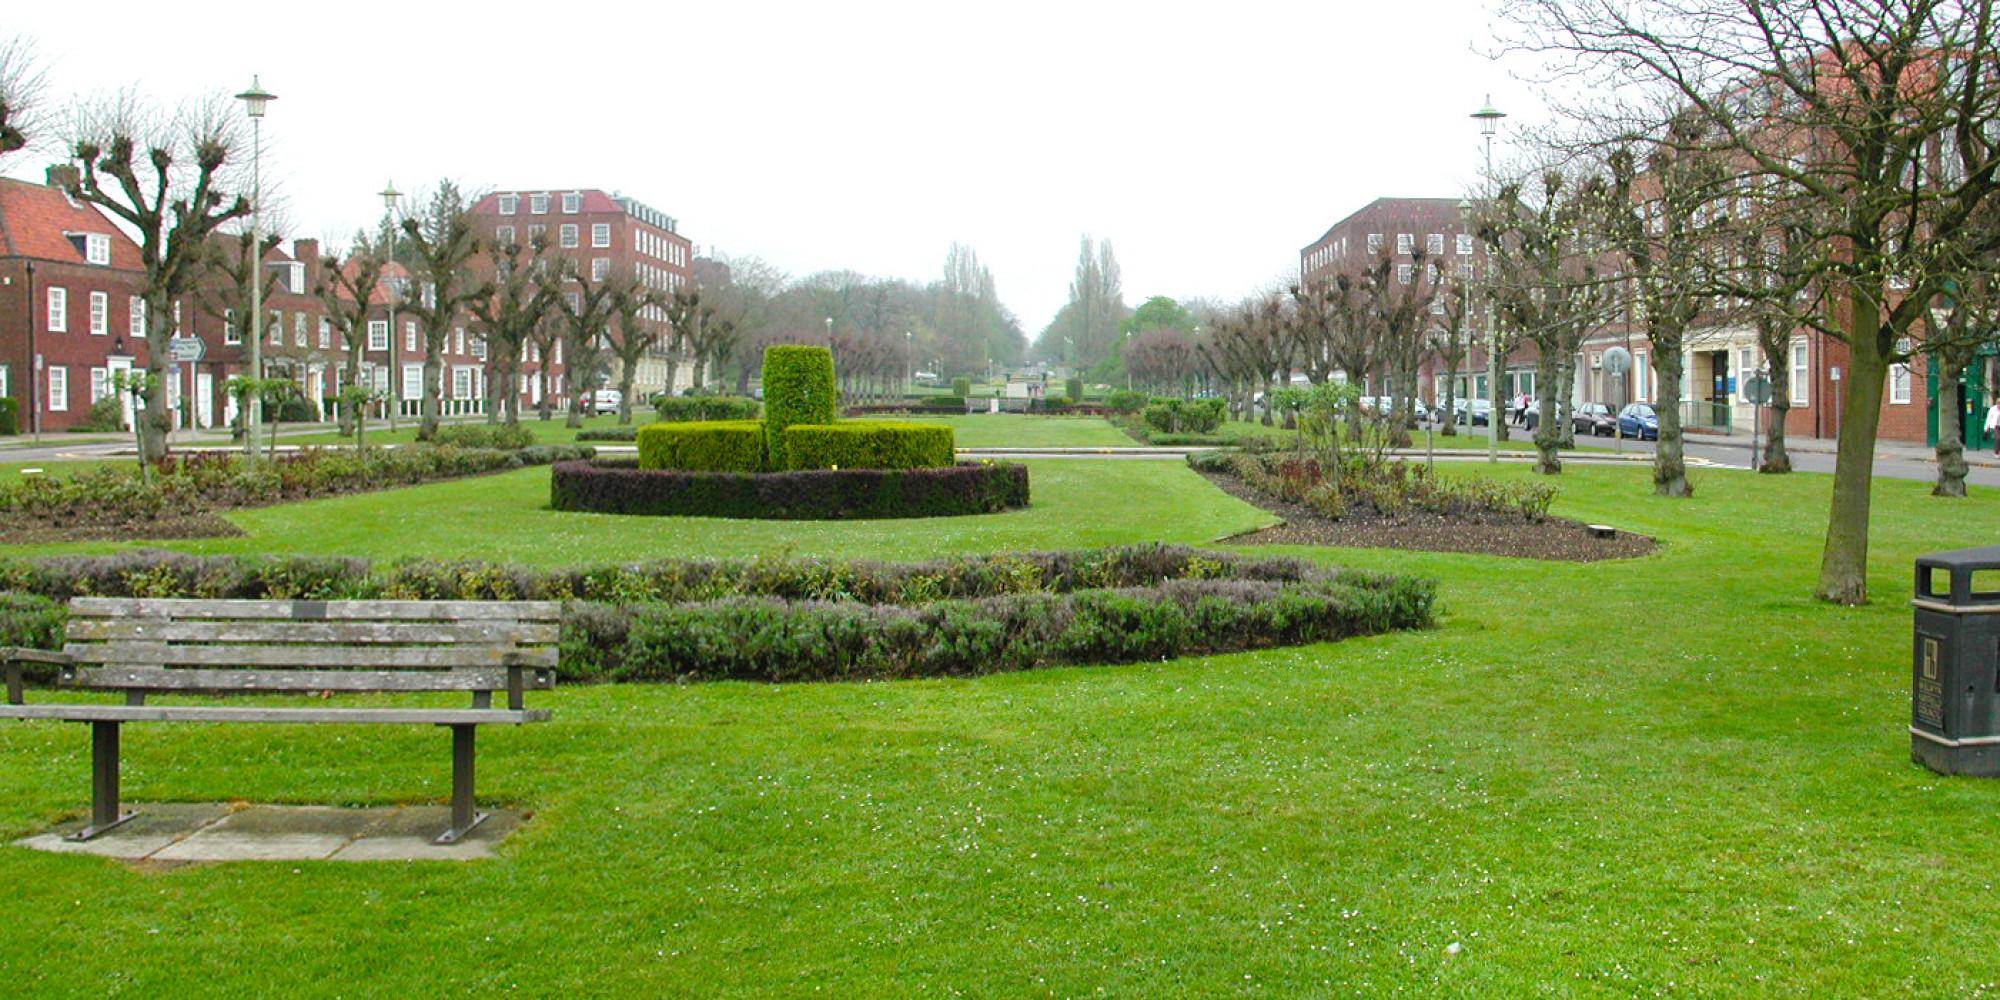 Garden cities plan 39 kept secret 39 by tories says tim - Welwyn garden city united kingdom ...